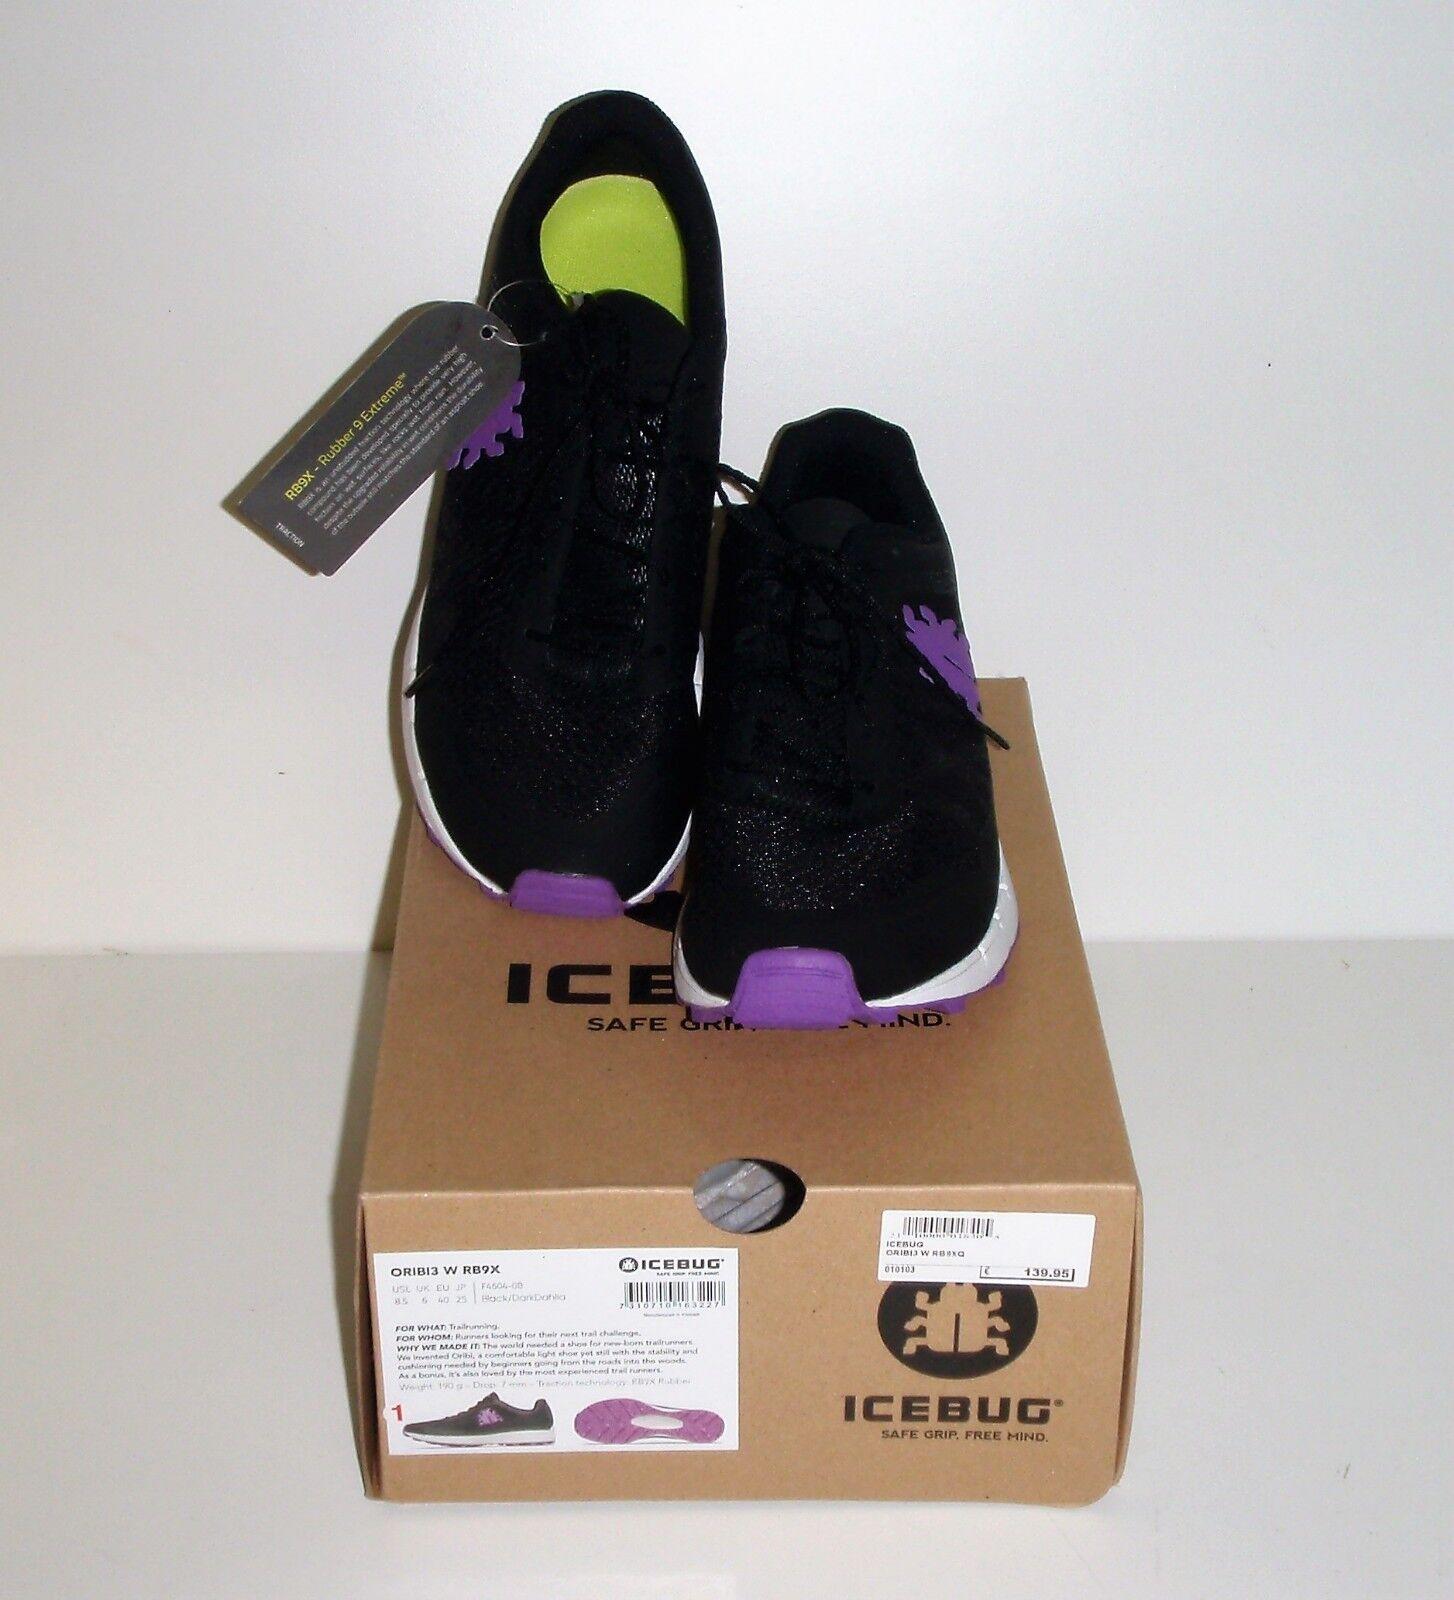 Icebug ORIBI3 W RB9X Black/DarkDahlia Sneaker Spotschuh Turnschuh Größe 40